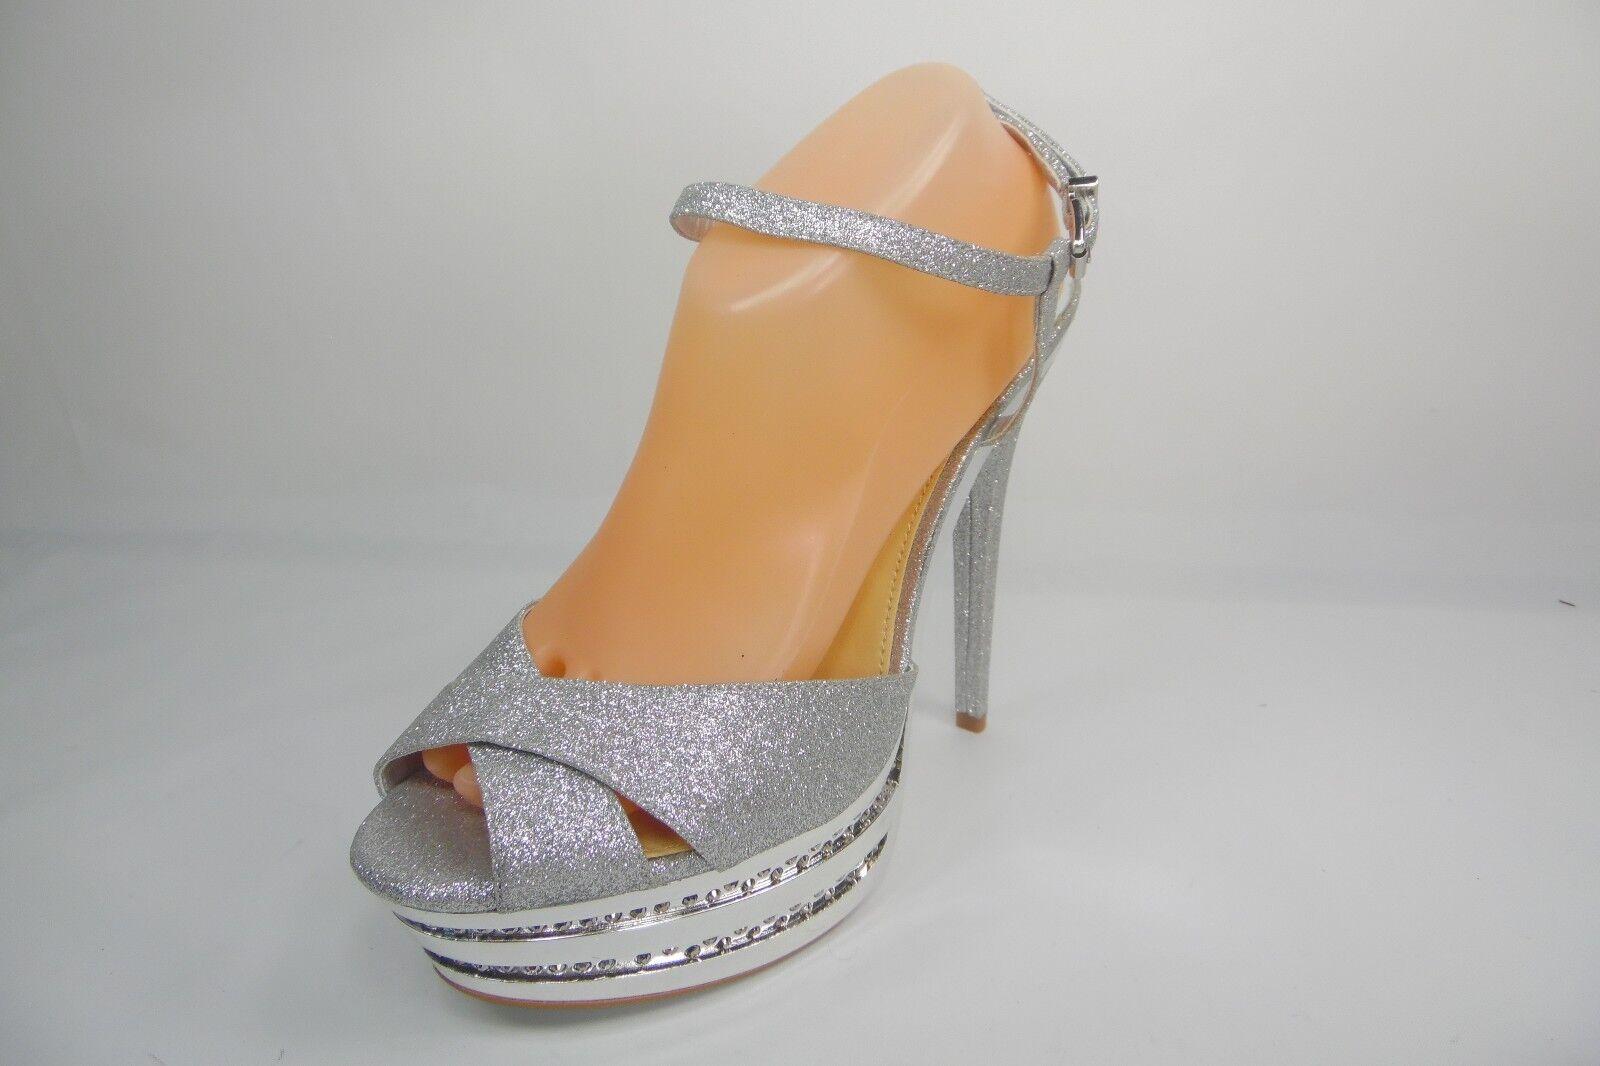 Gianni Bini Platform Heels Strap Sandals Silver Size 11M